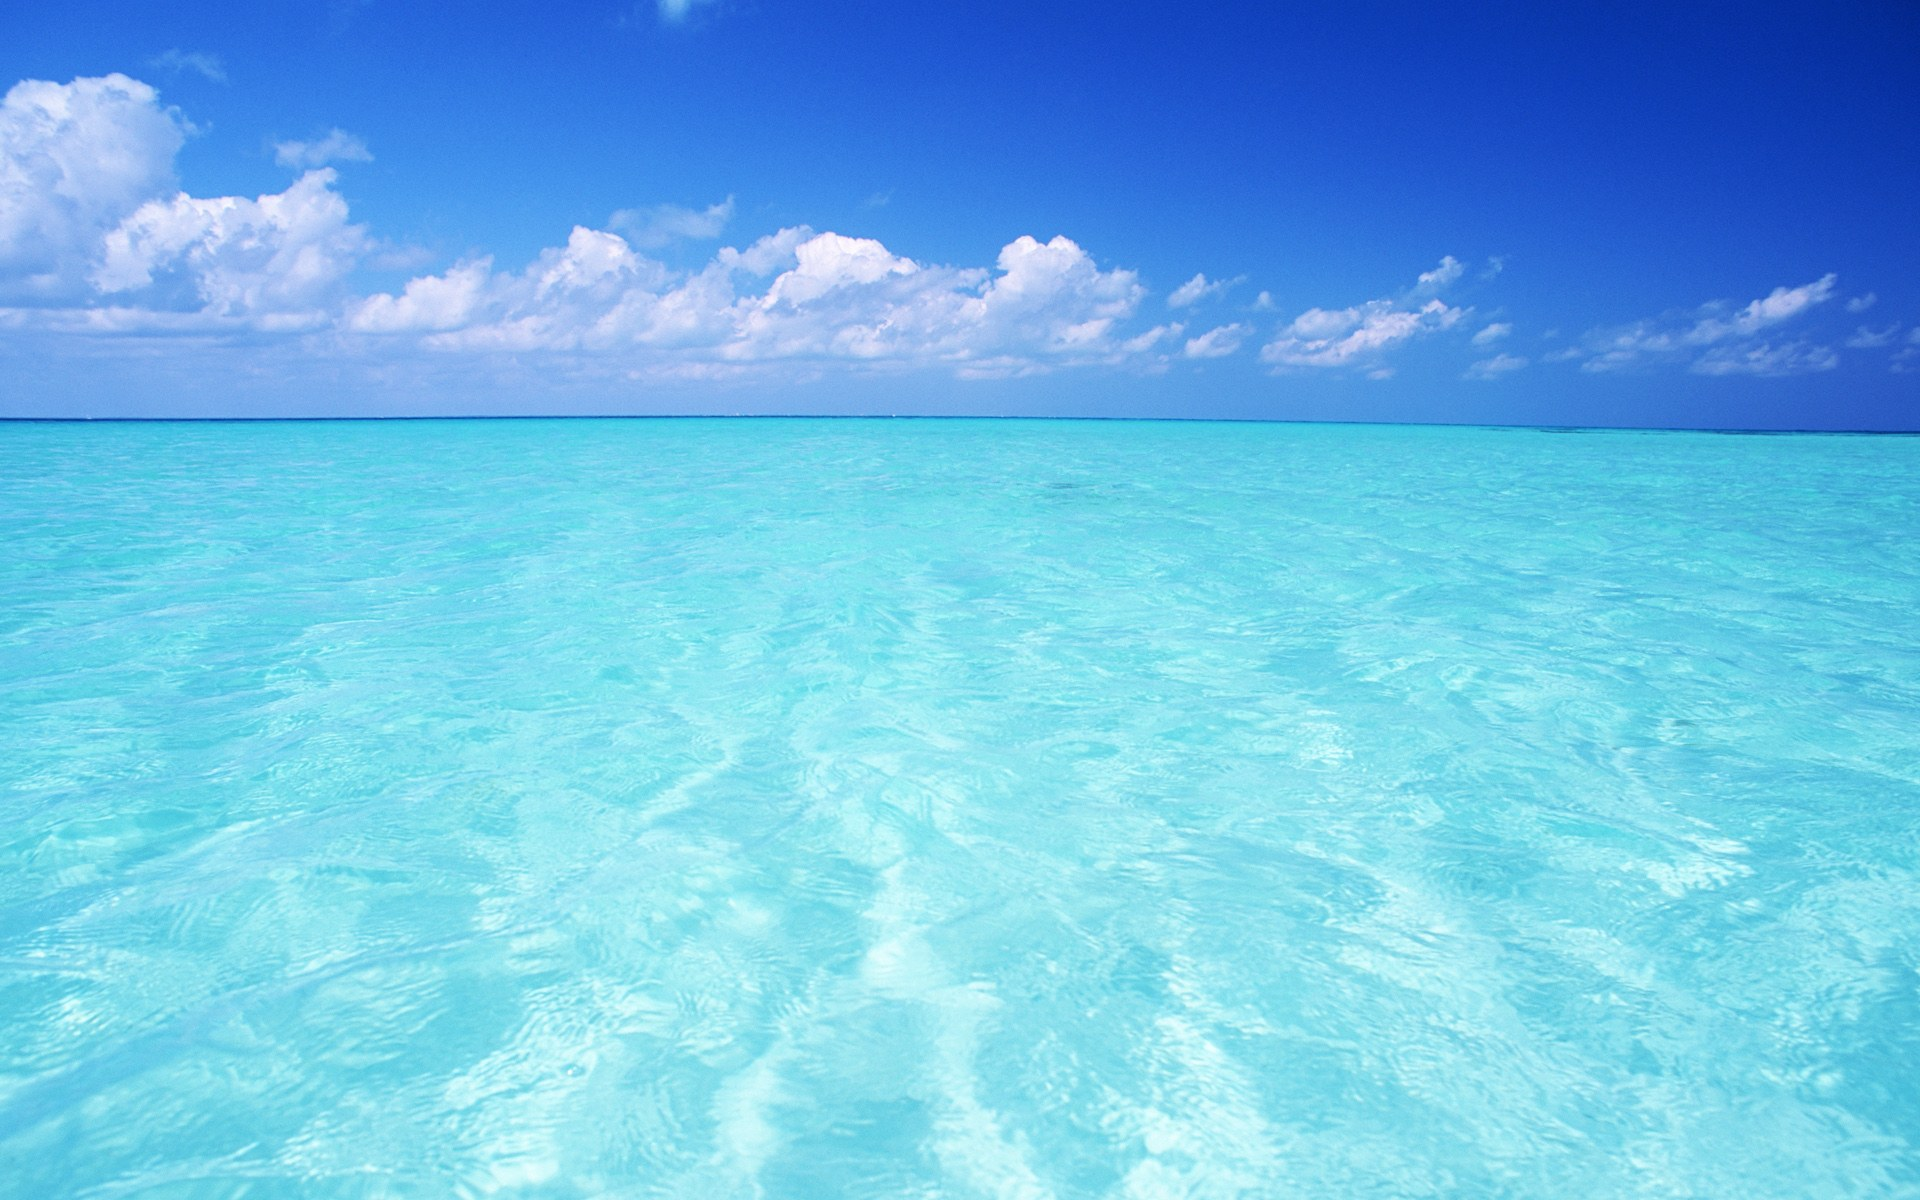 Maldives Sky Sea Aquamarine water Wallpapers 1920 x 1200 1920x1200